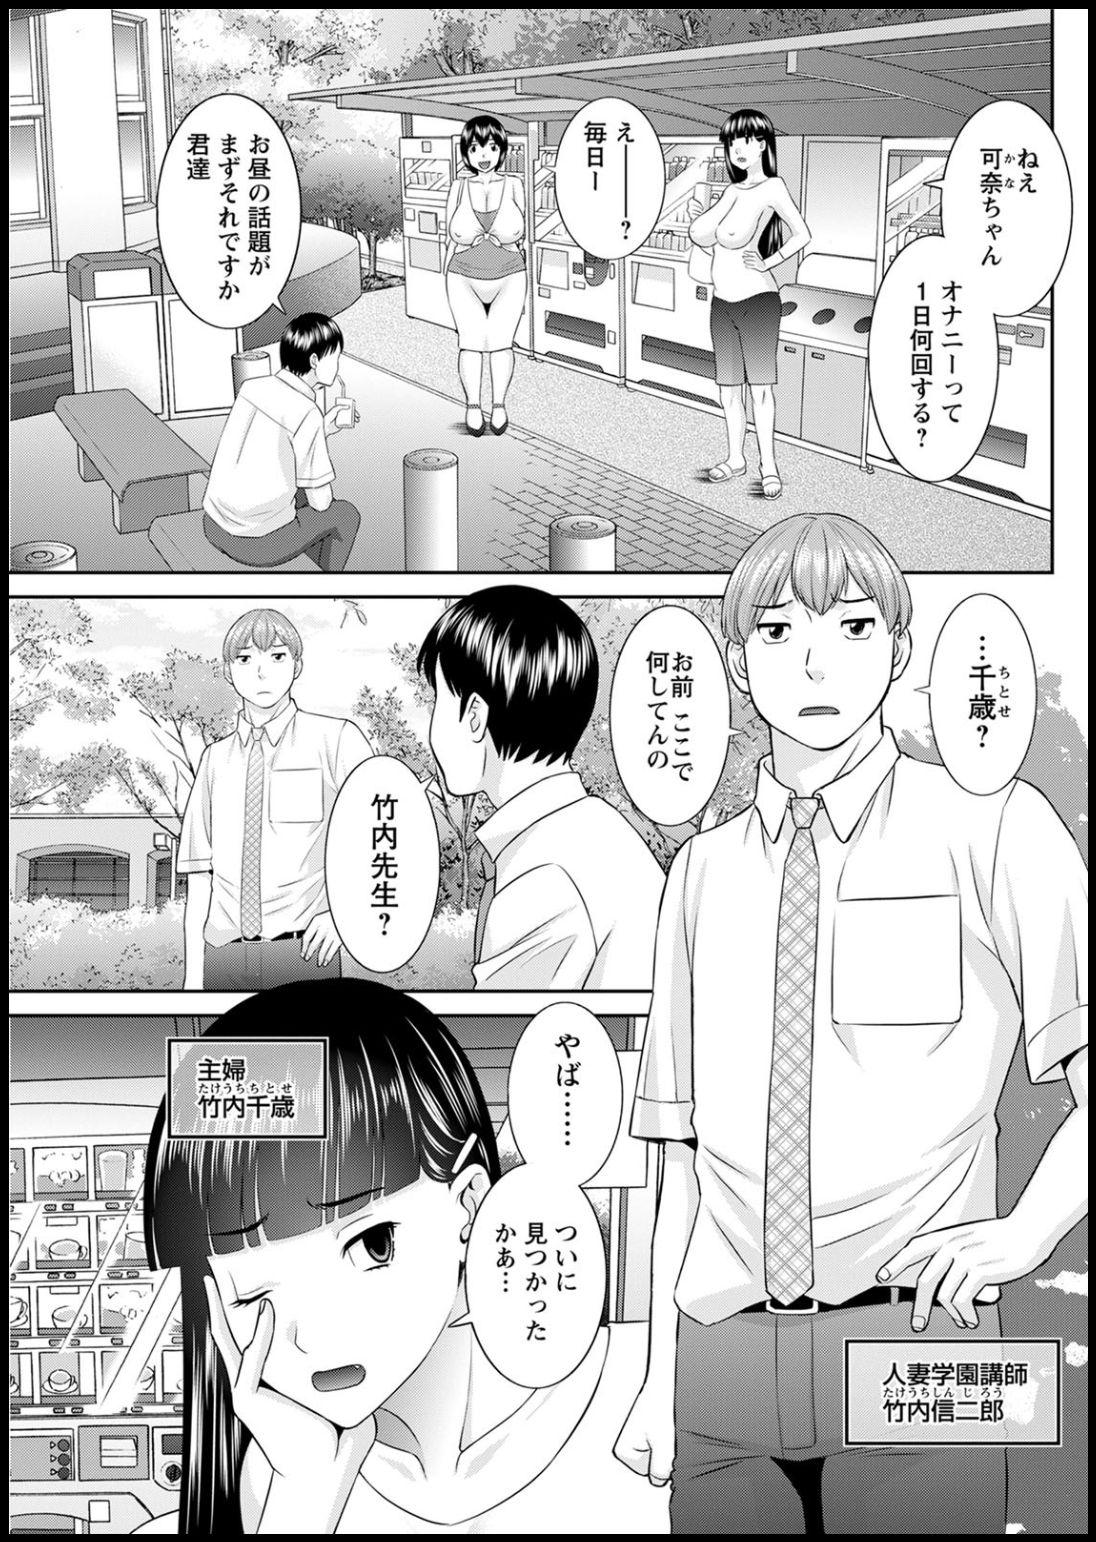 [Kawamori Misaki] Kaikan Hitotsuma Gakuen Ch. 1-6, 8-20 [Digital] 275